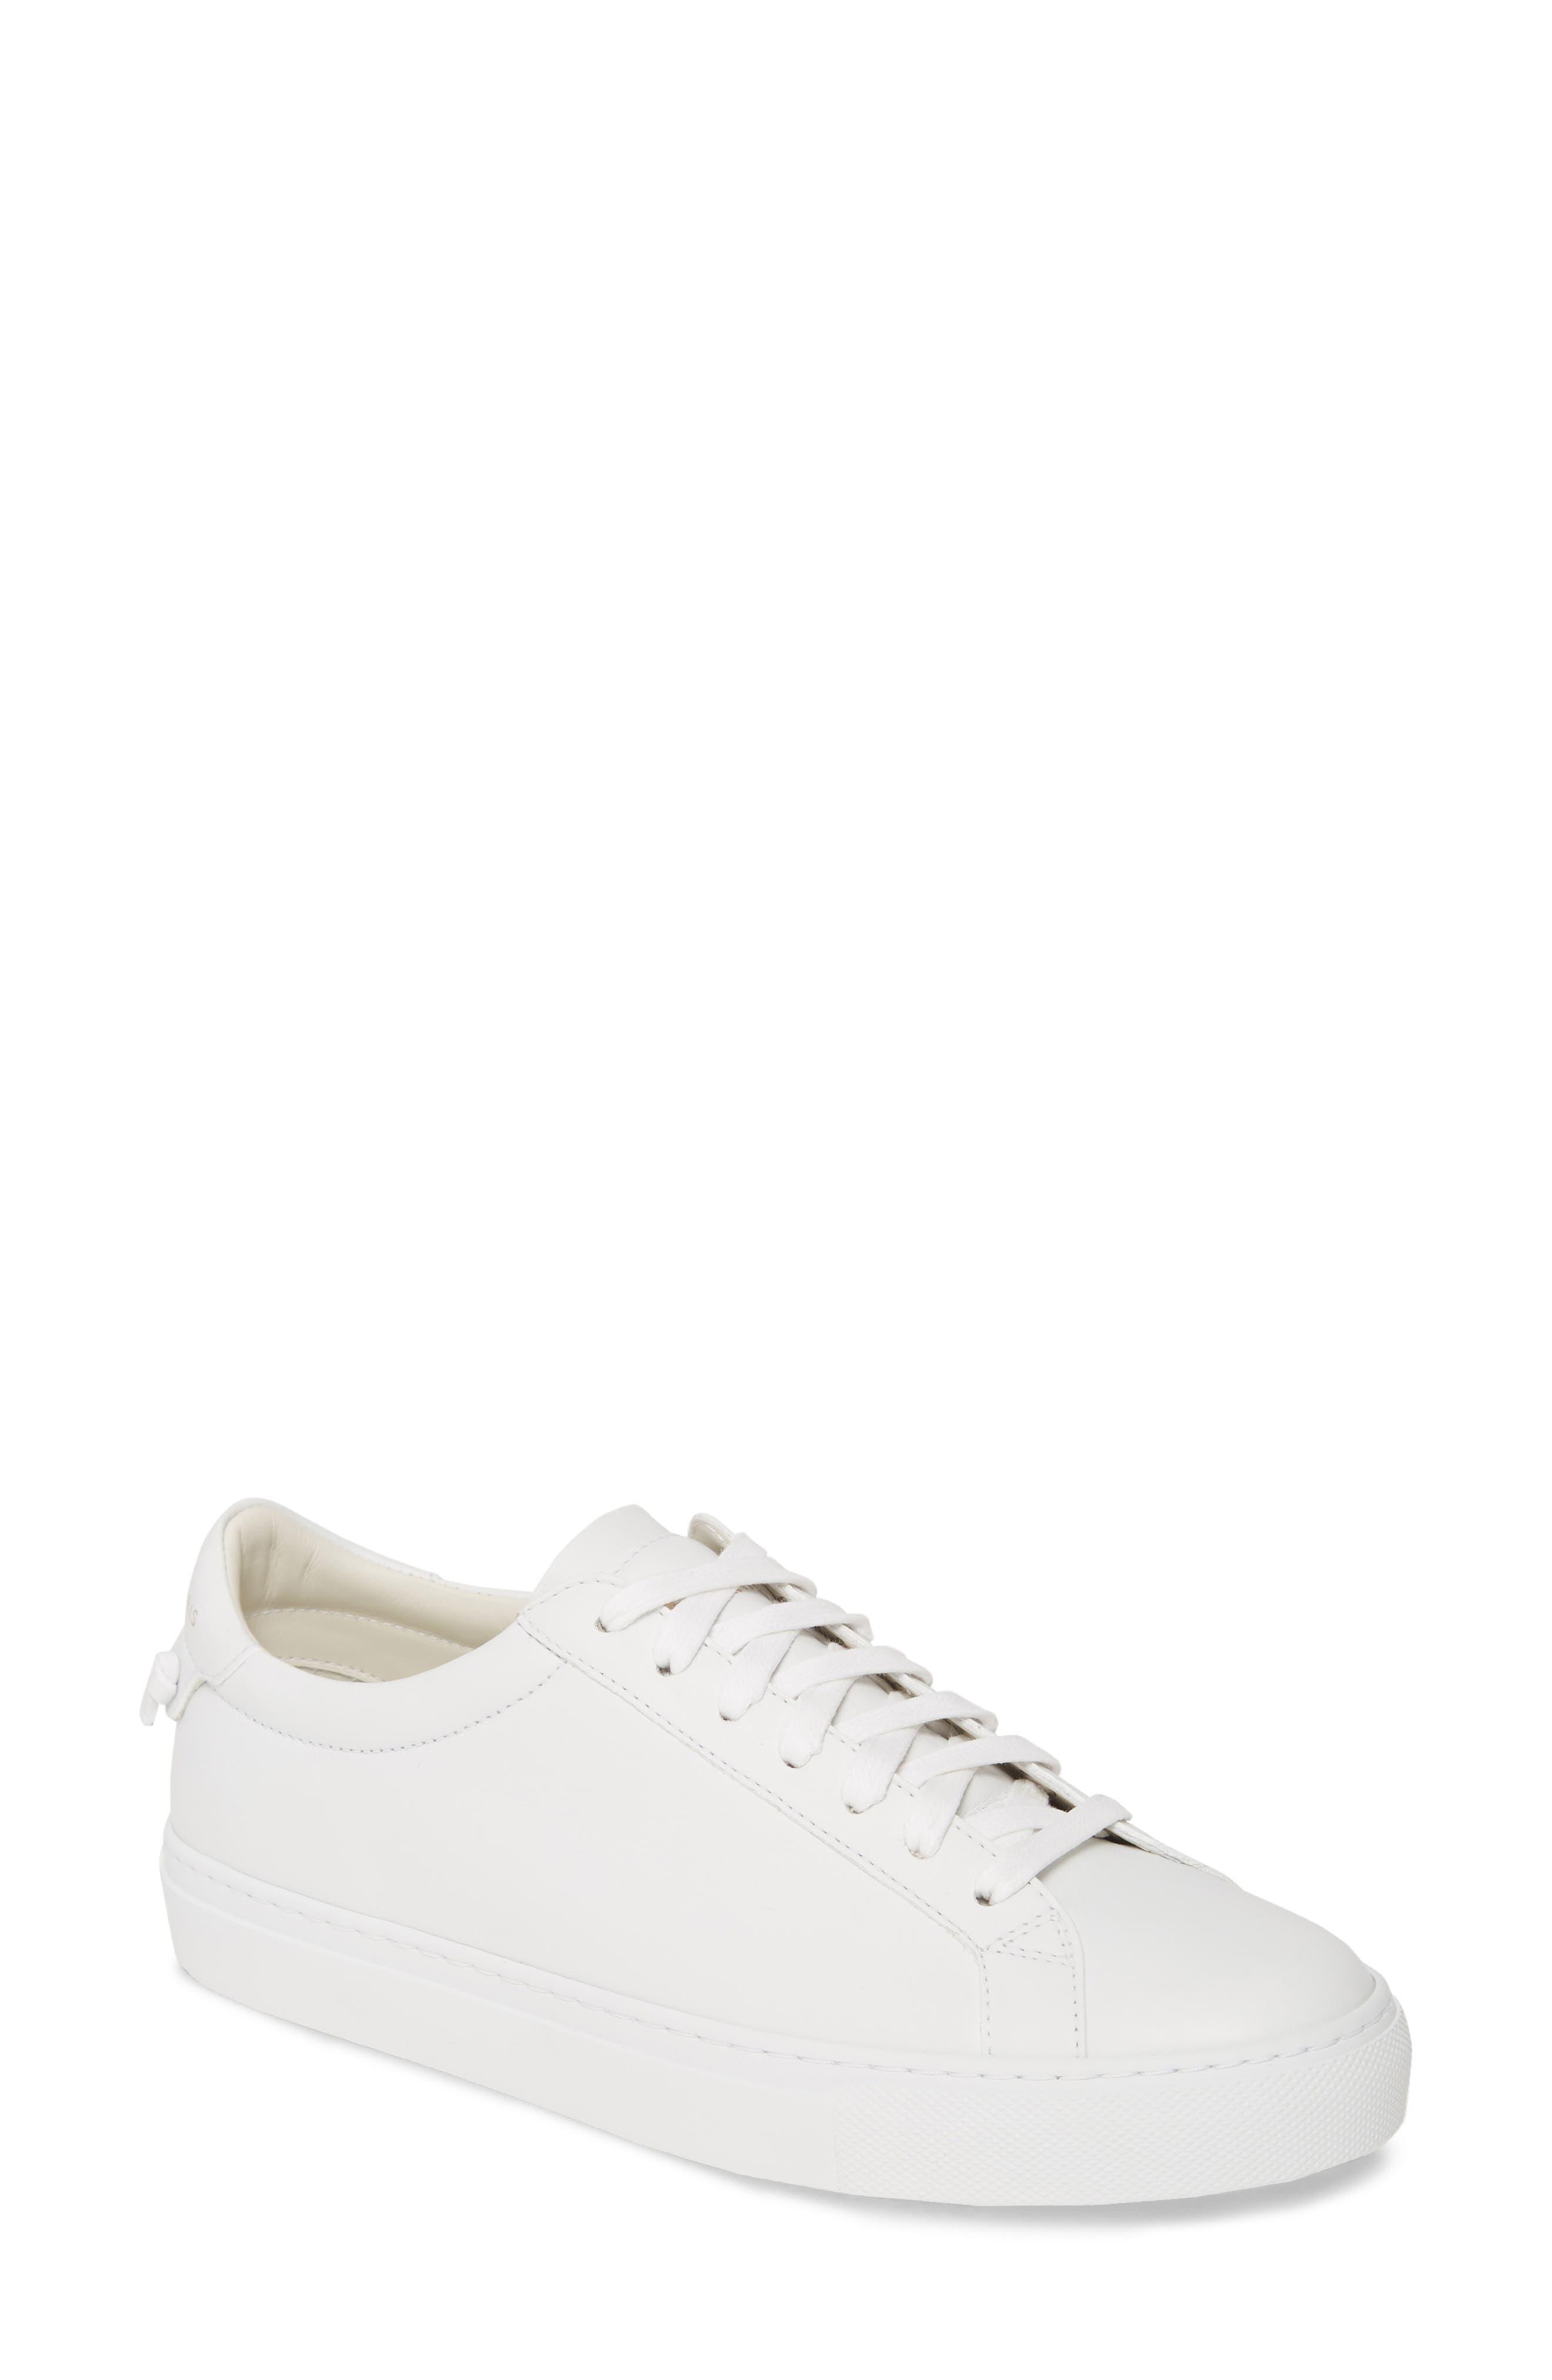 Givenchy Urban Street Low Top Sneaker, White